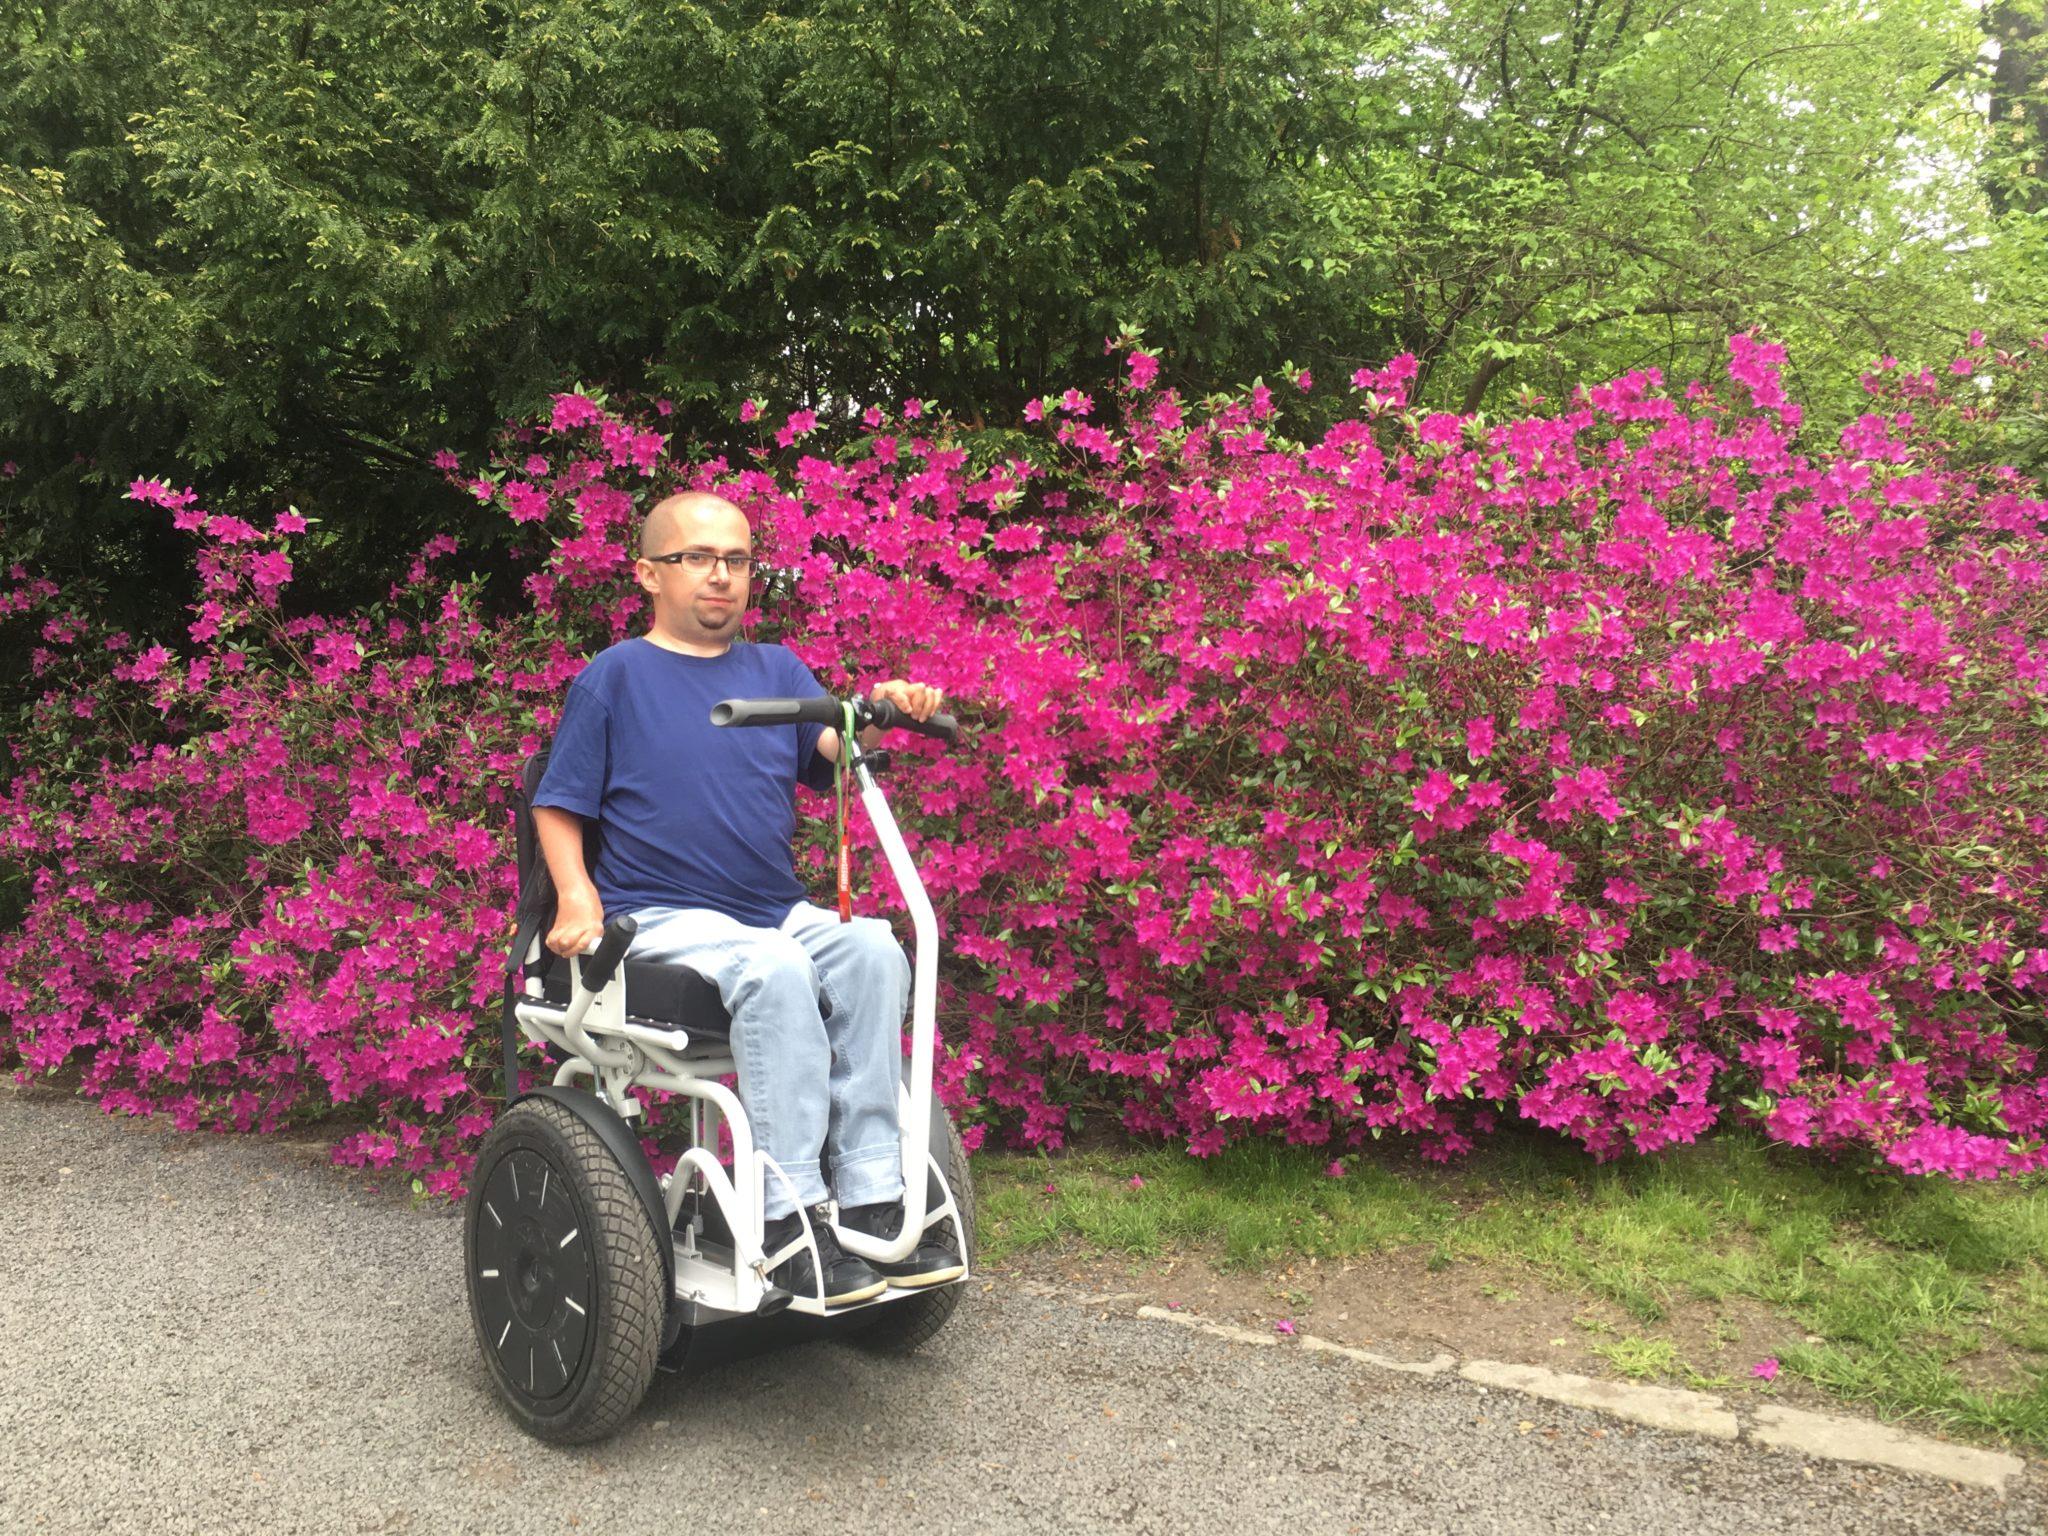 blumil wózek inwalidzki